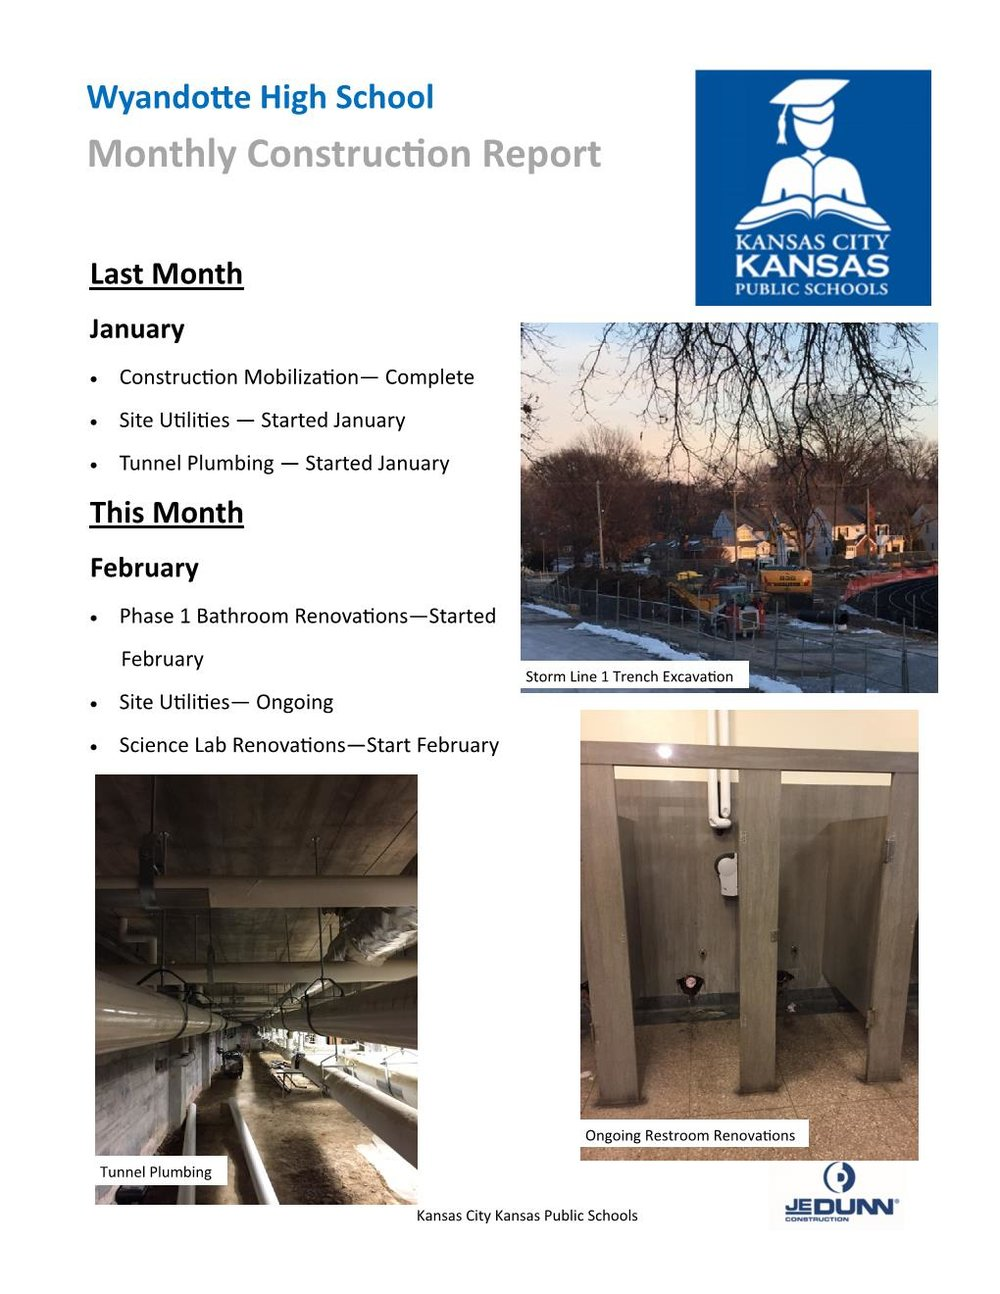 2018.02.15 - Wyandotte February Photo Report.jpg